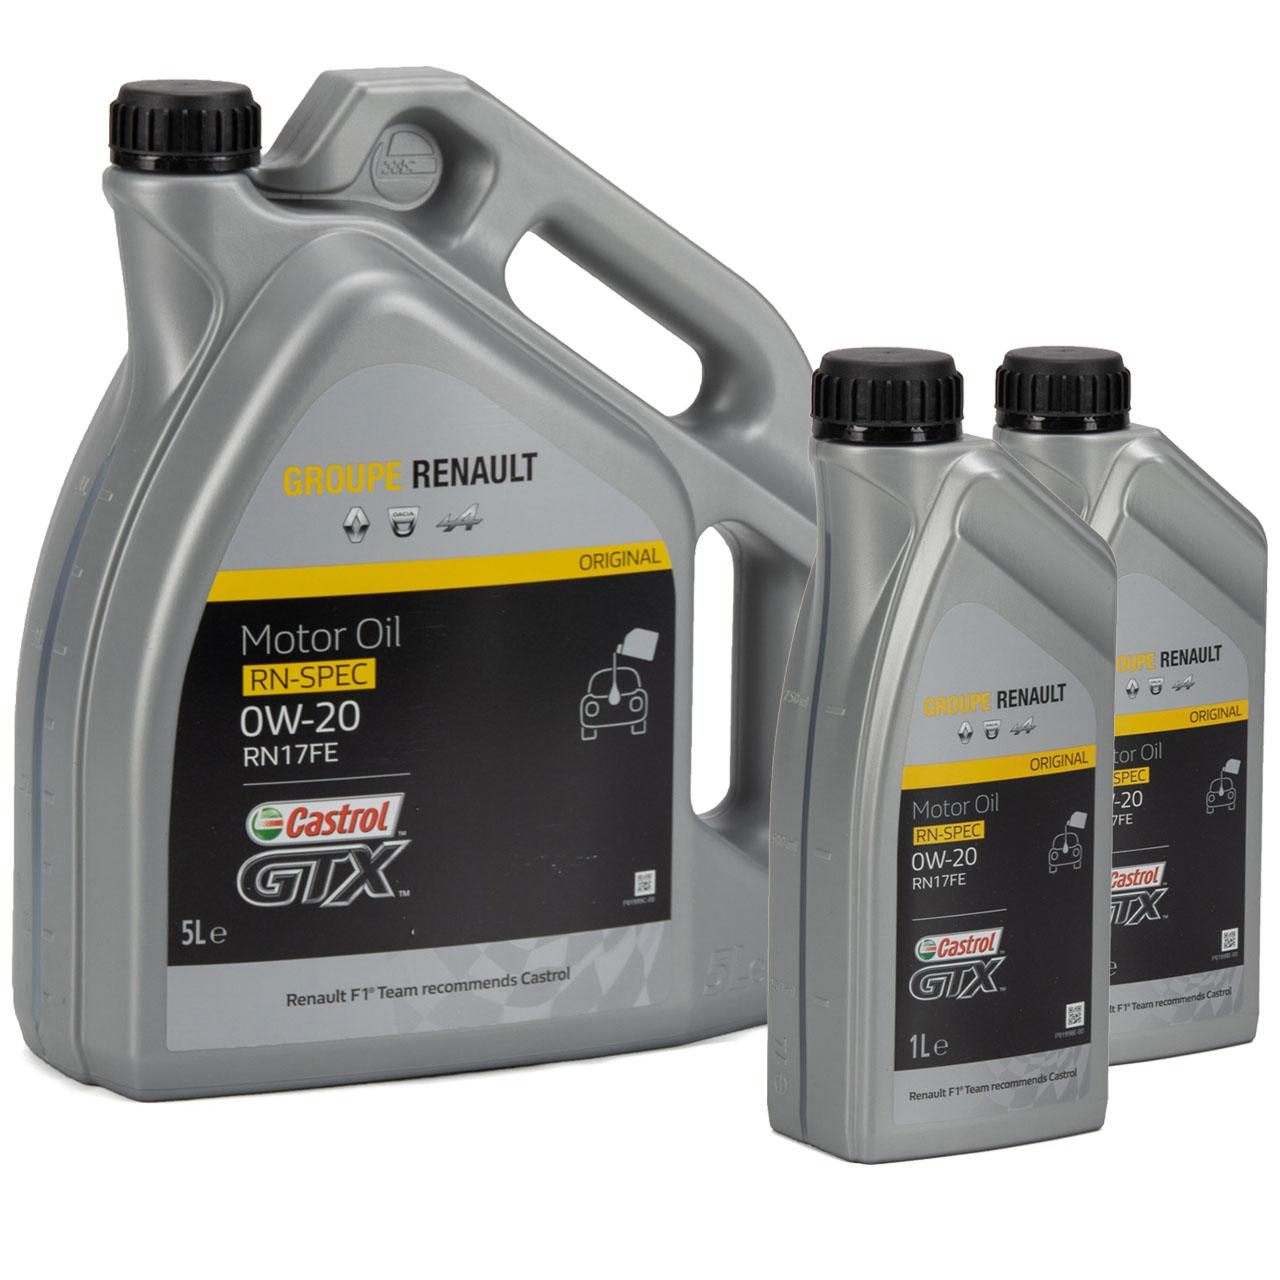 CASTROL Motoröl Öl GTX RN-SPEC 0W-20 0W20 für Renault RN17FE - 7L 7 Liter